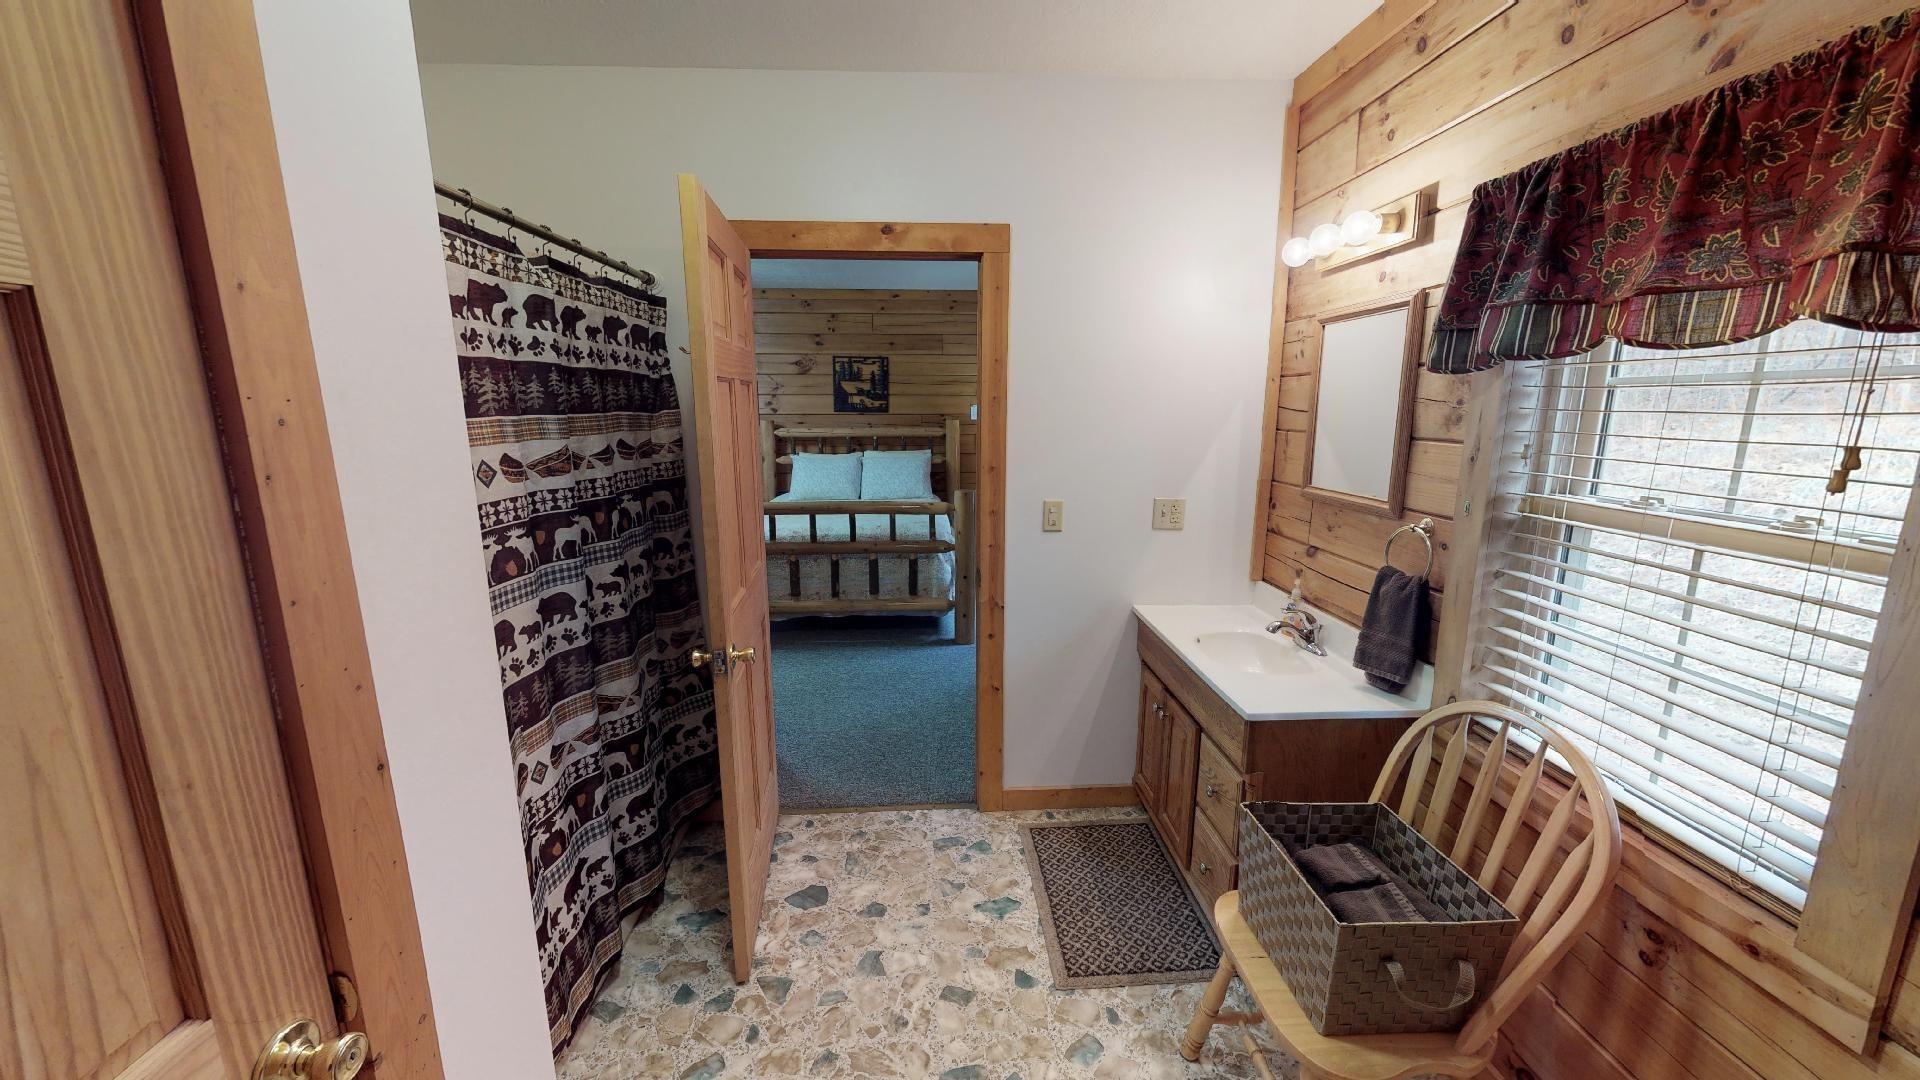 Briarwood Bathroom - Full tub/shower combo.